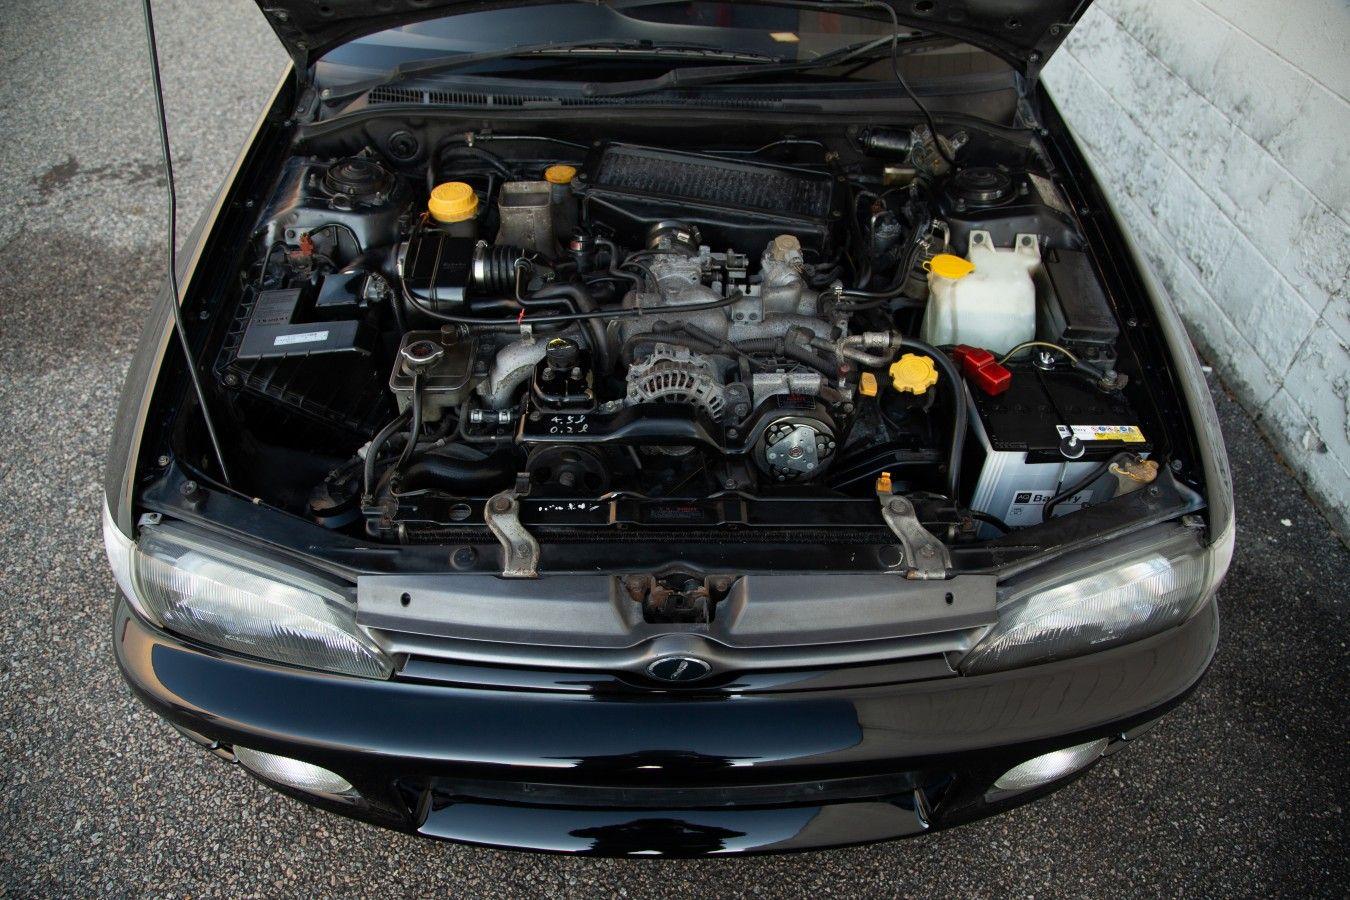 Live Your JDM Dreams Using This 1993 Subaru Impreza WRX GC8